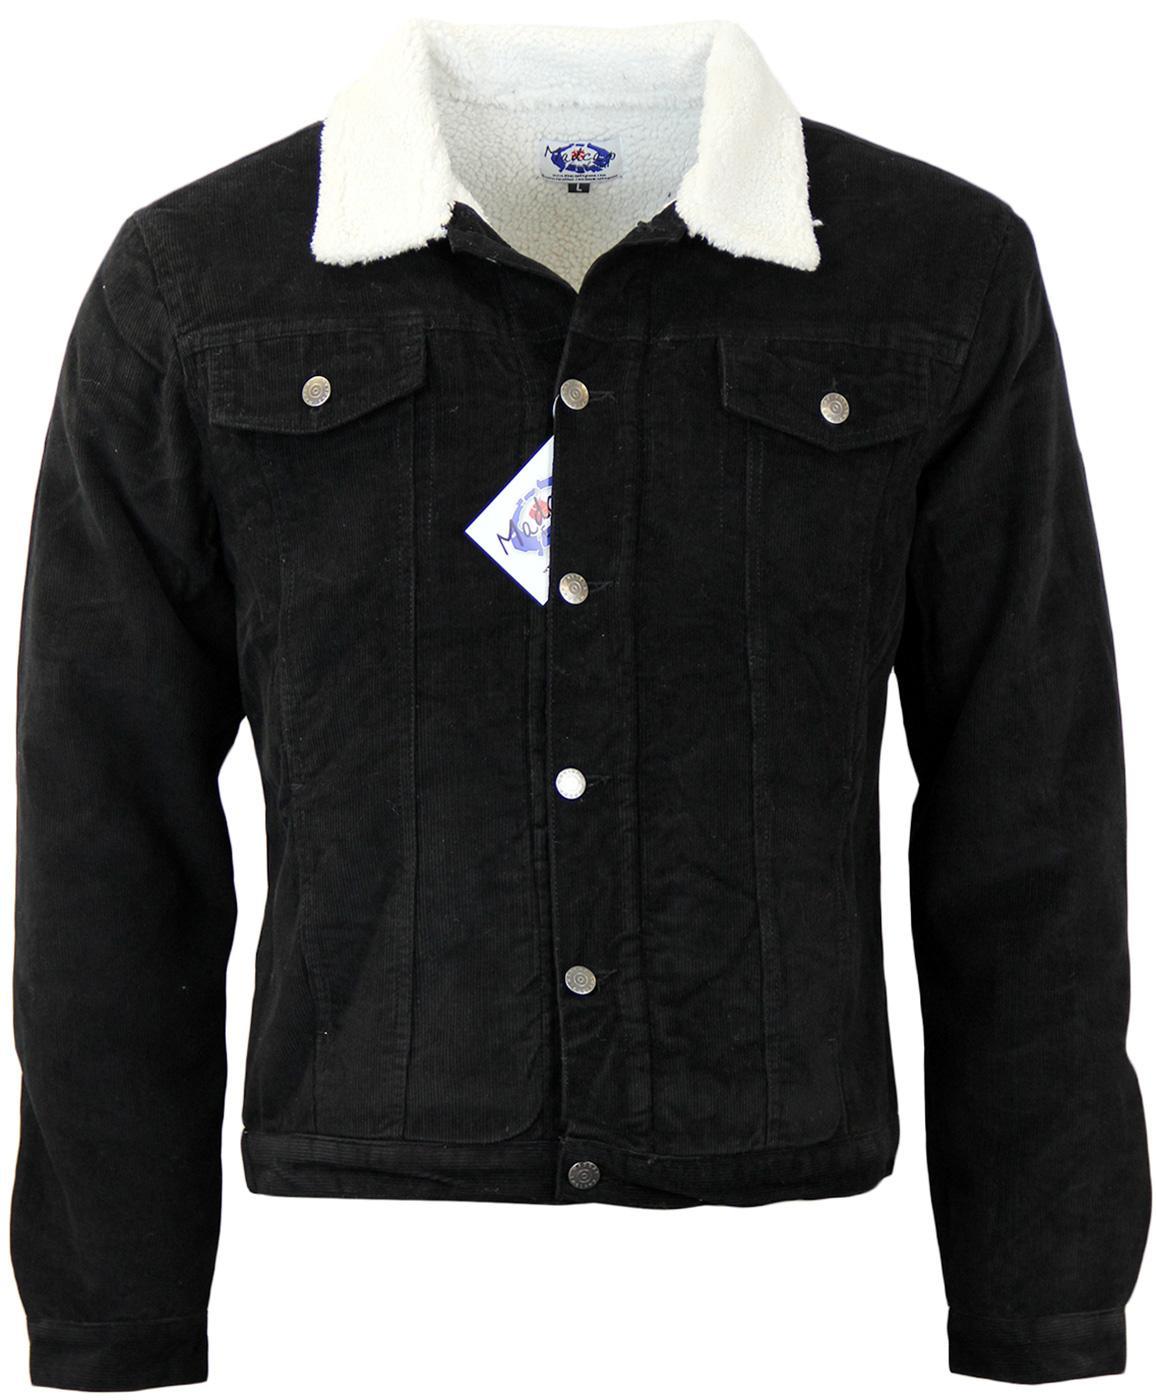 Contender MADCAP ENGLAND Sherpa Lined Jacket BLACK